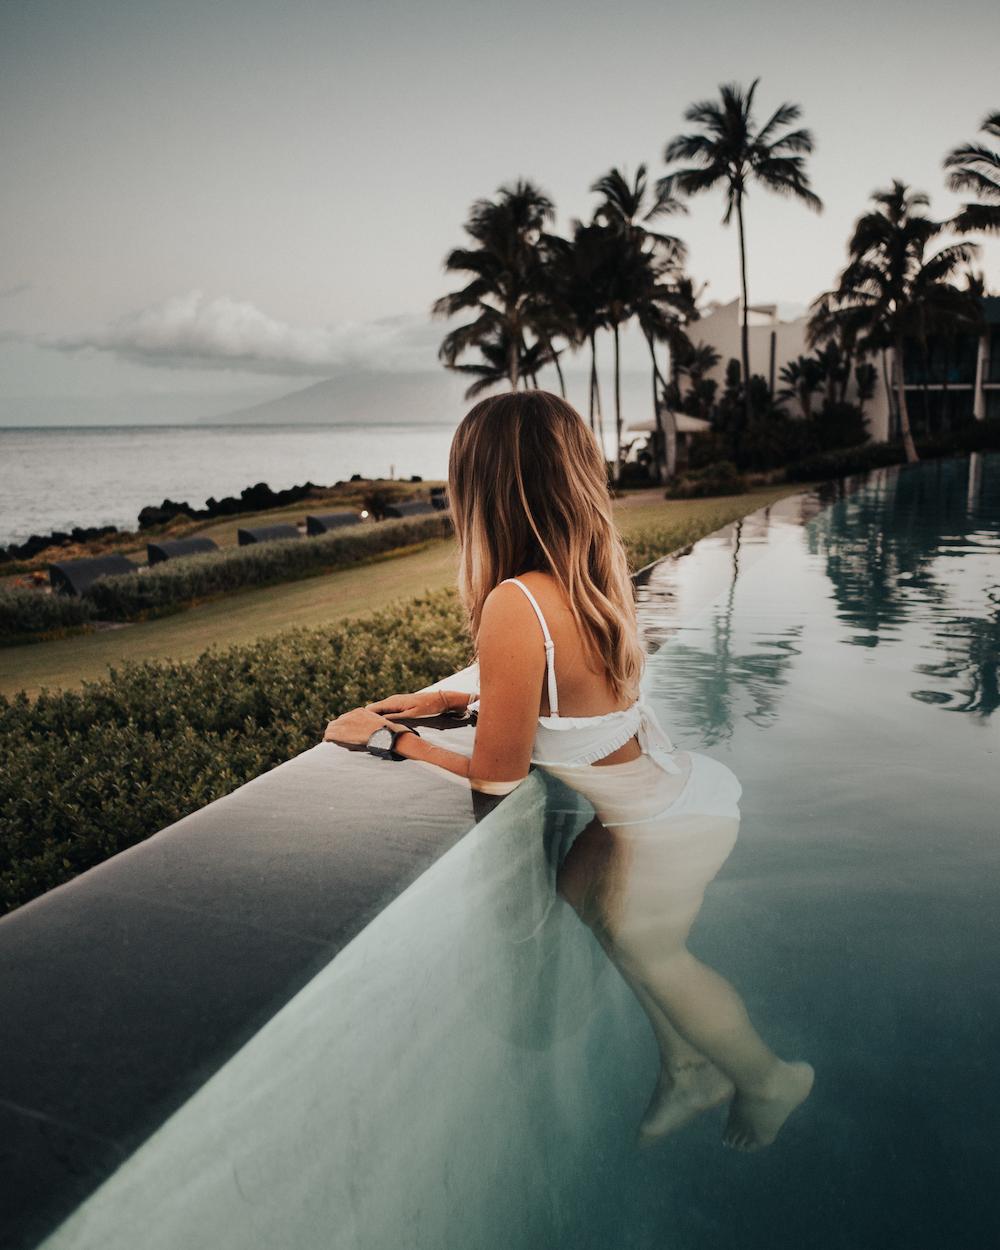 woman wearing white bikini in pool during daytime